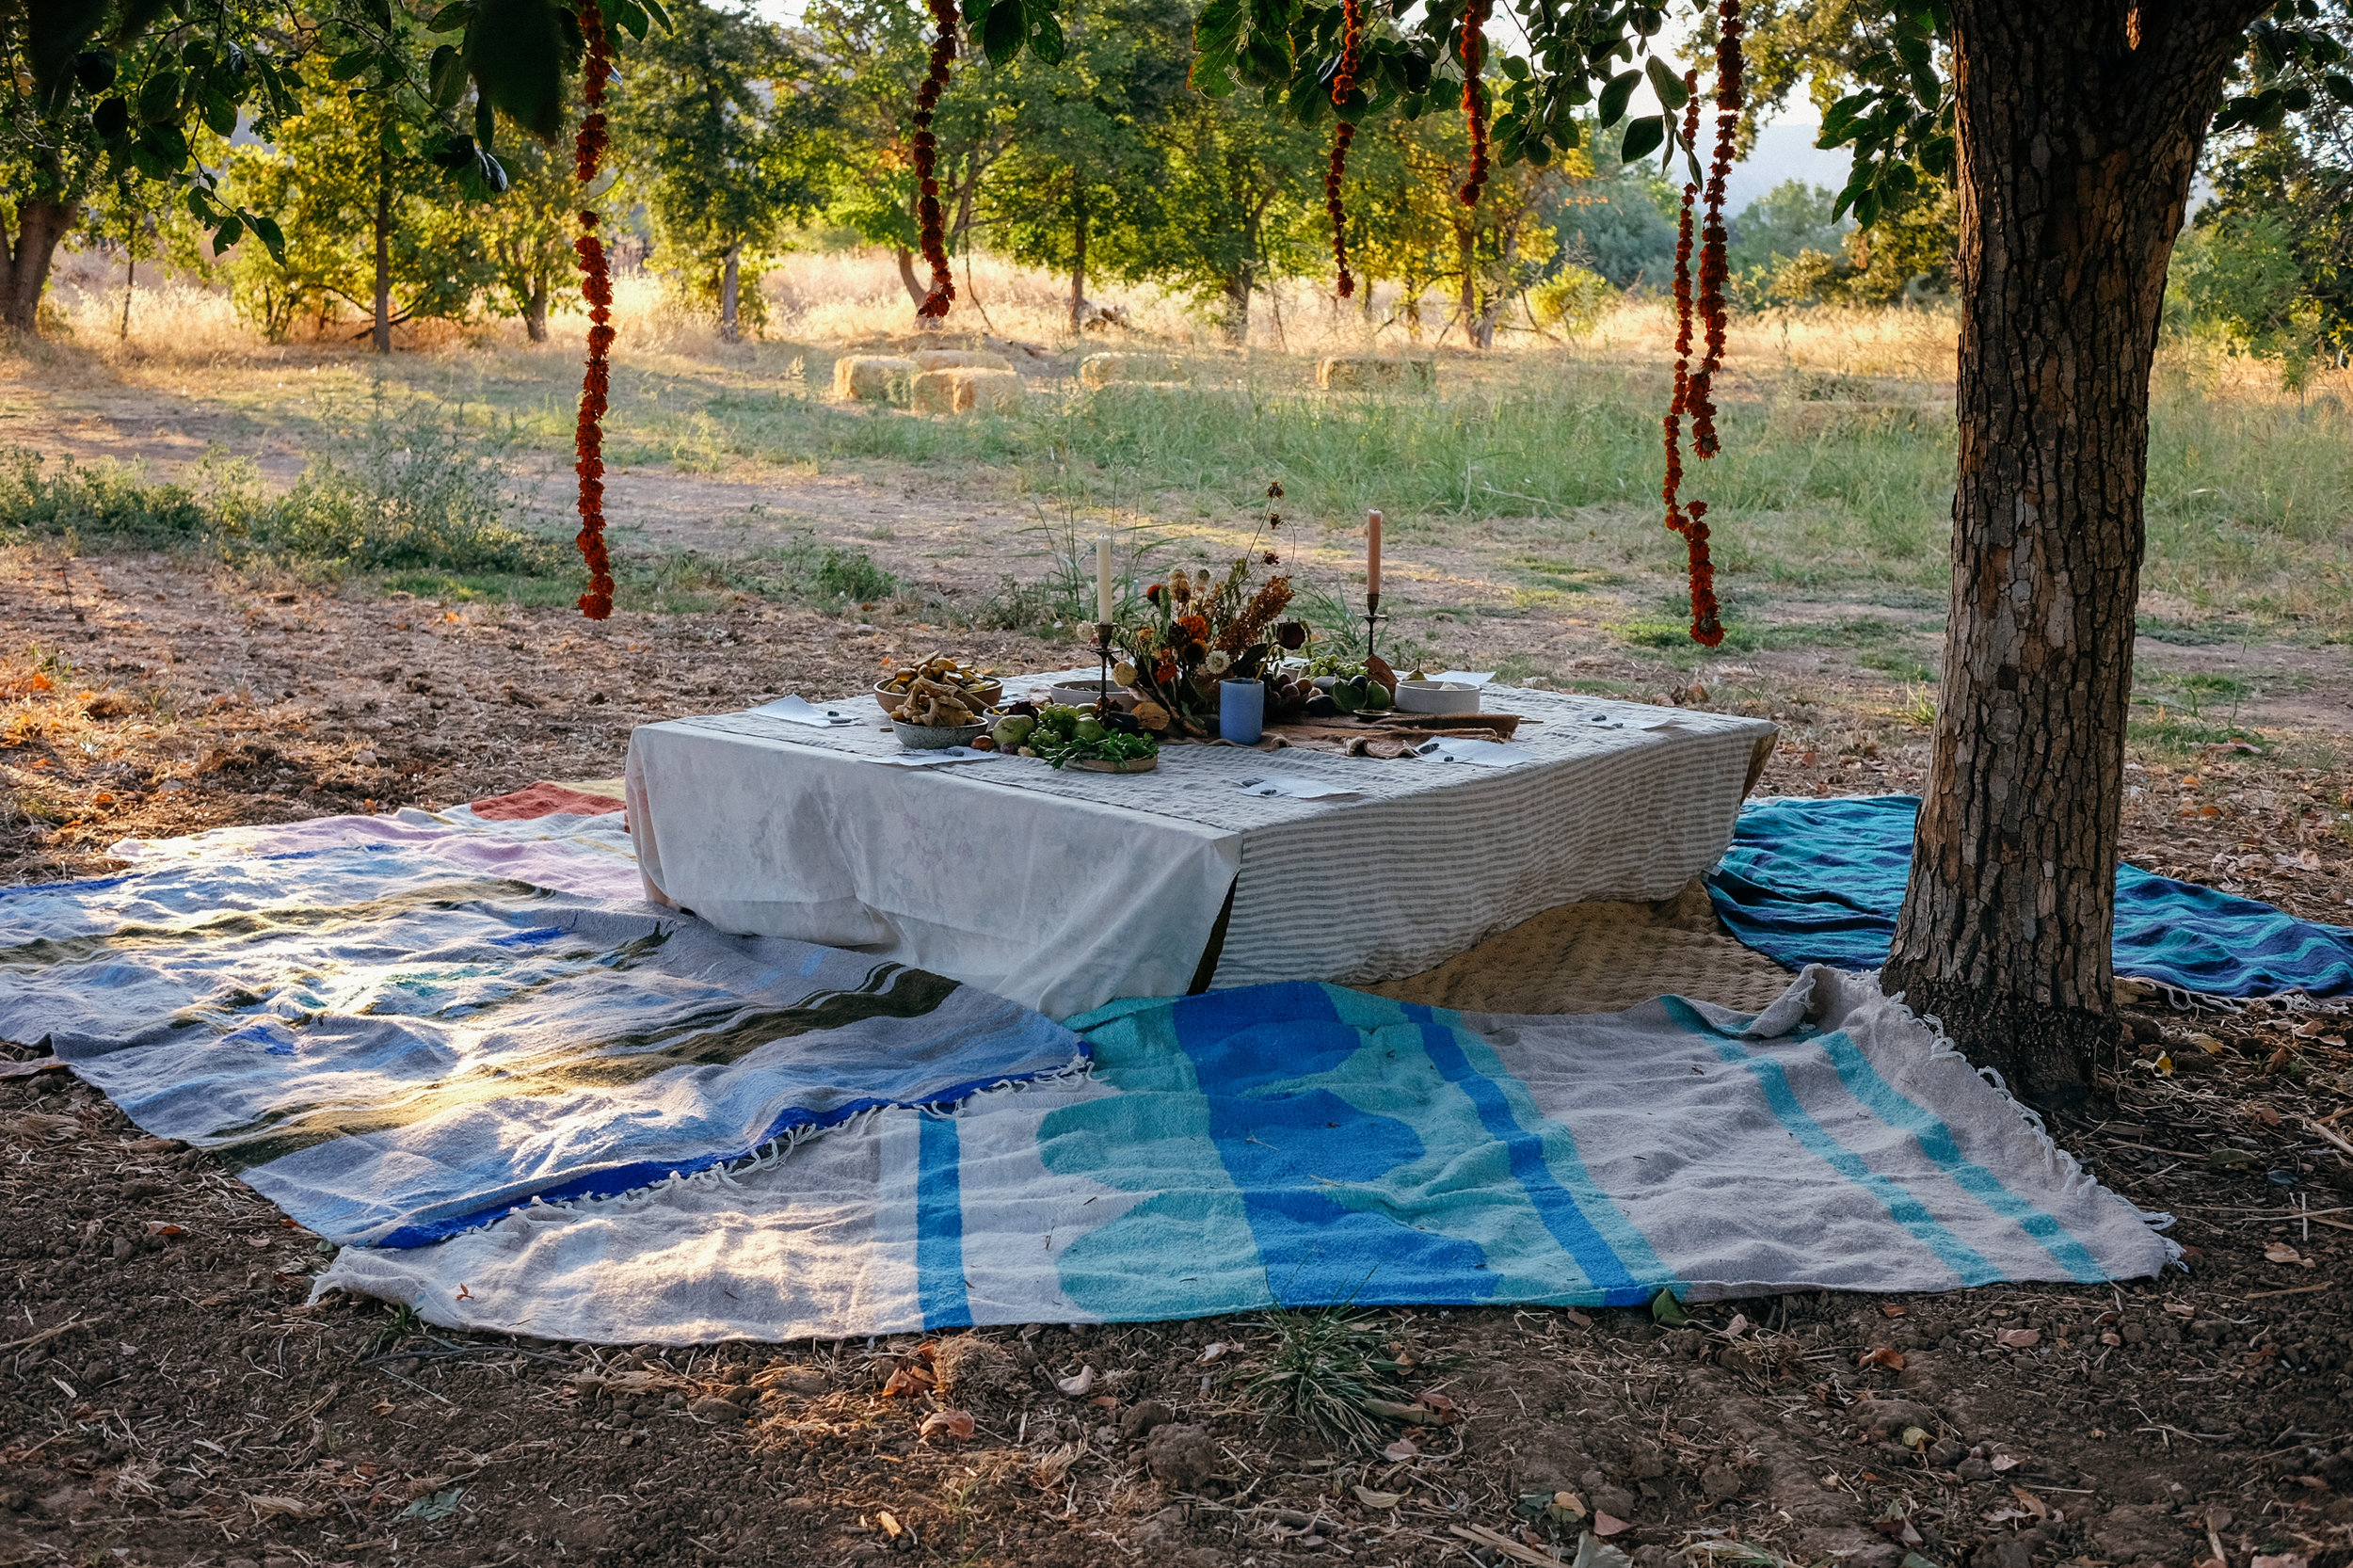 COLLAB DINNER FEAT. FARMER HANDS, NIPOMO & TOTEM CO. 08/27/17 @ FULL BELLY FARM, GUINDA • CALIFORNIA